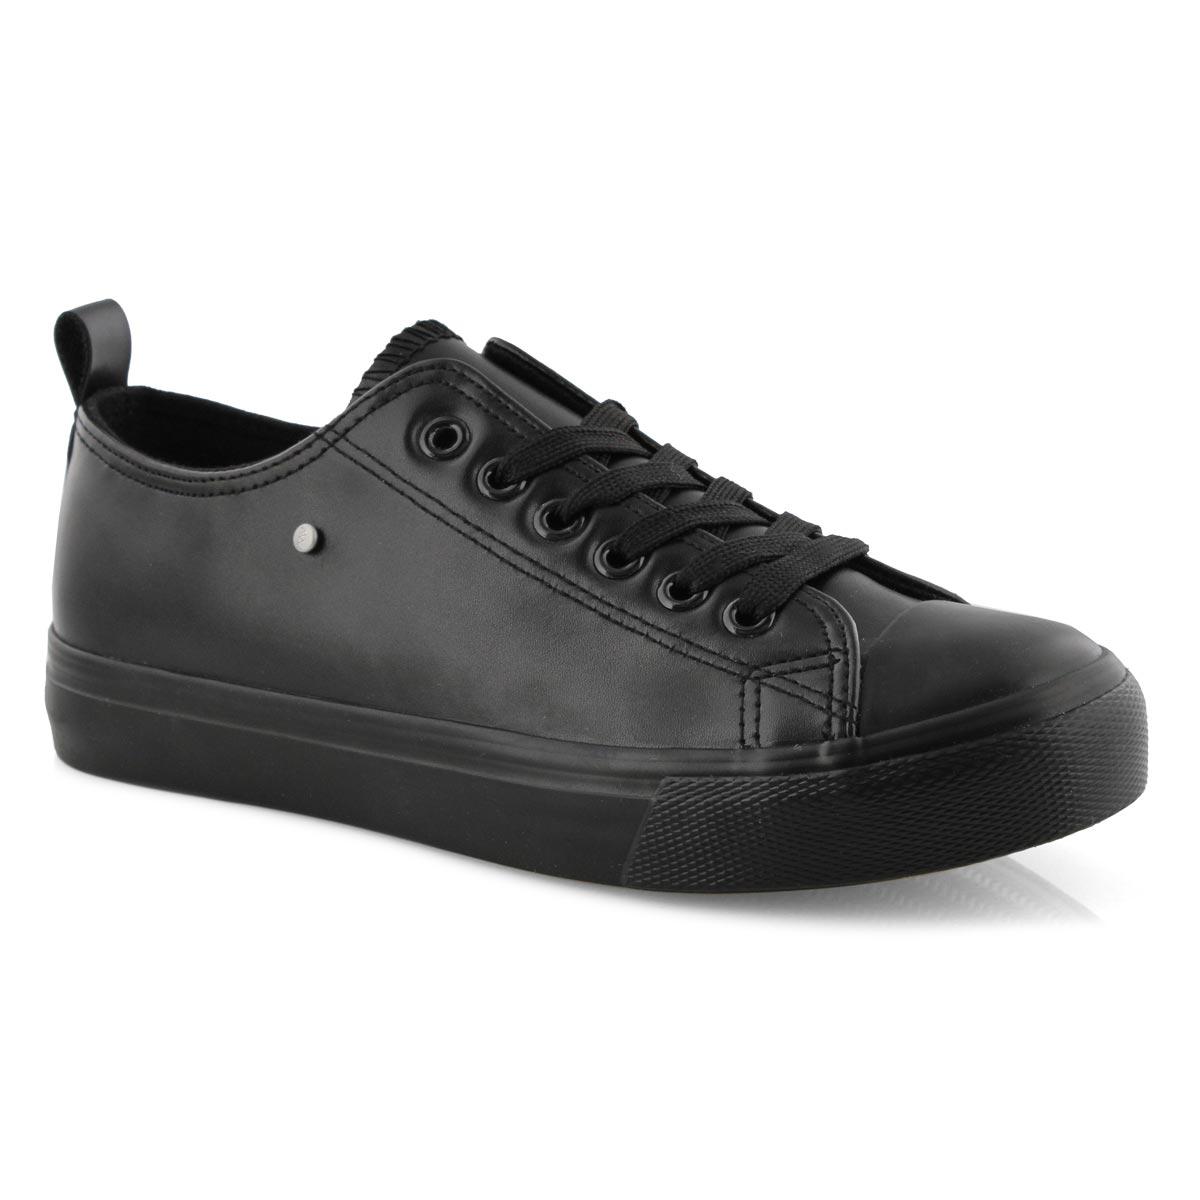 Lds Hazel black vegan lace up sneaker